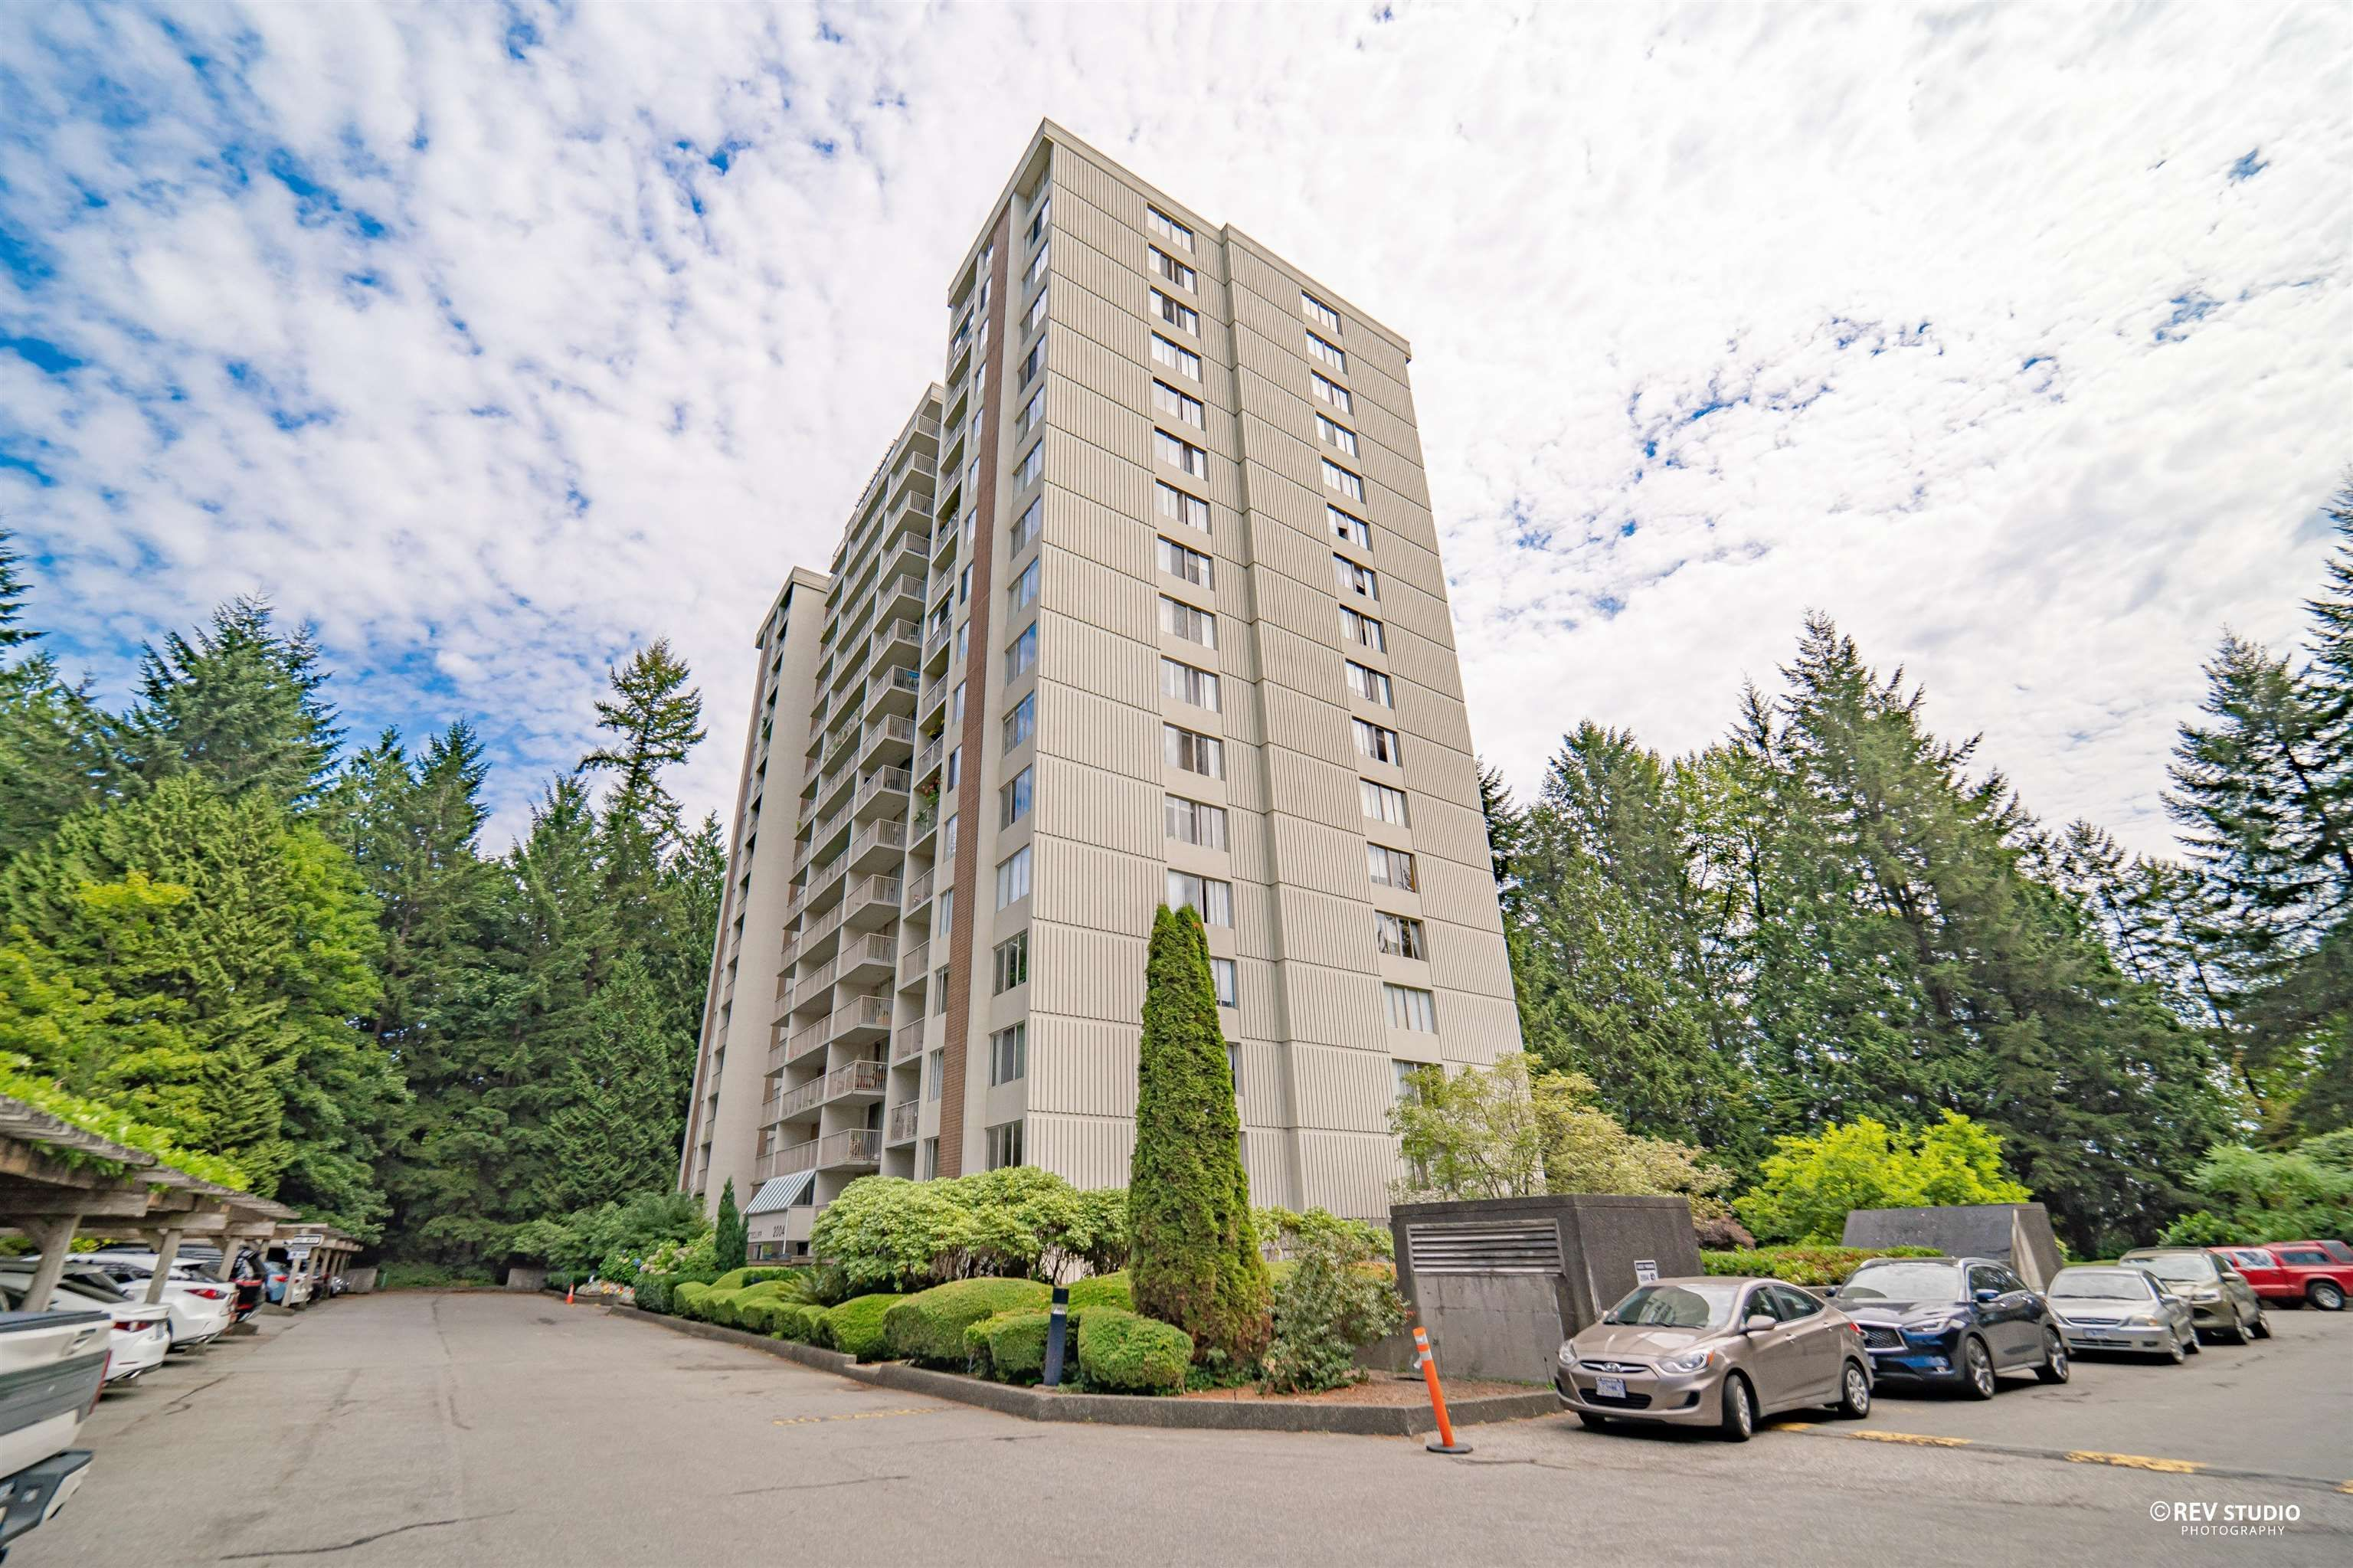 Main Photo: 204 2004 FULLERTON Avenue in North Vancouver: Pemberton NV Condo for sale : MLS®# R2611172